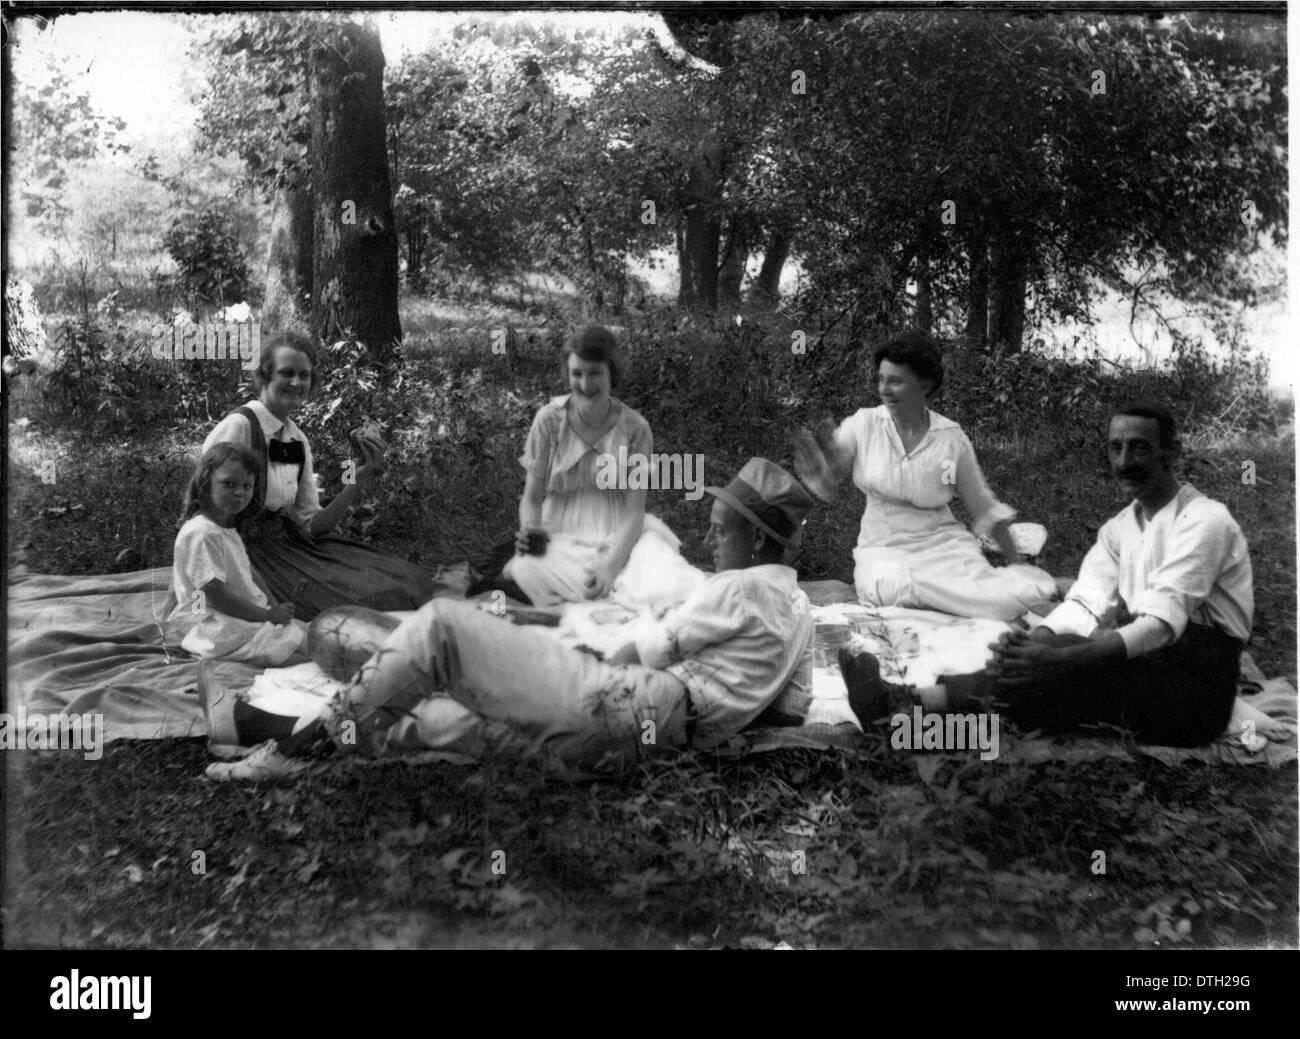 1924 photo Fielding H 1//23//24 Vintage Black /& White Photograph f1 Yost /& wife